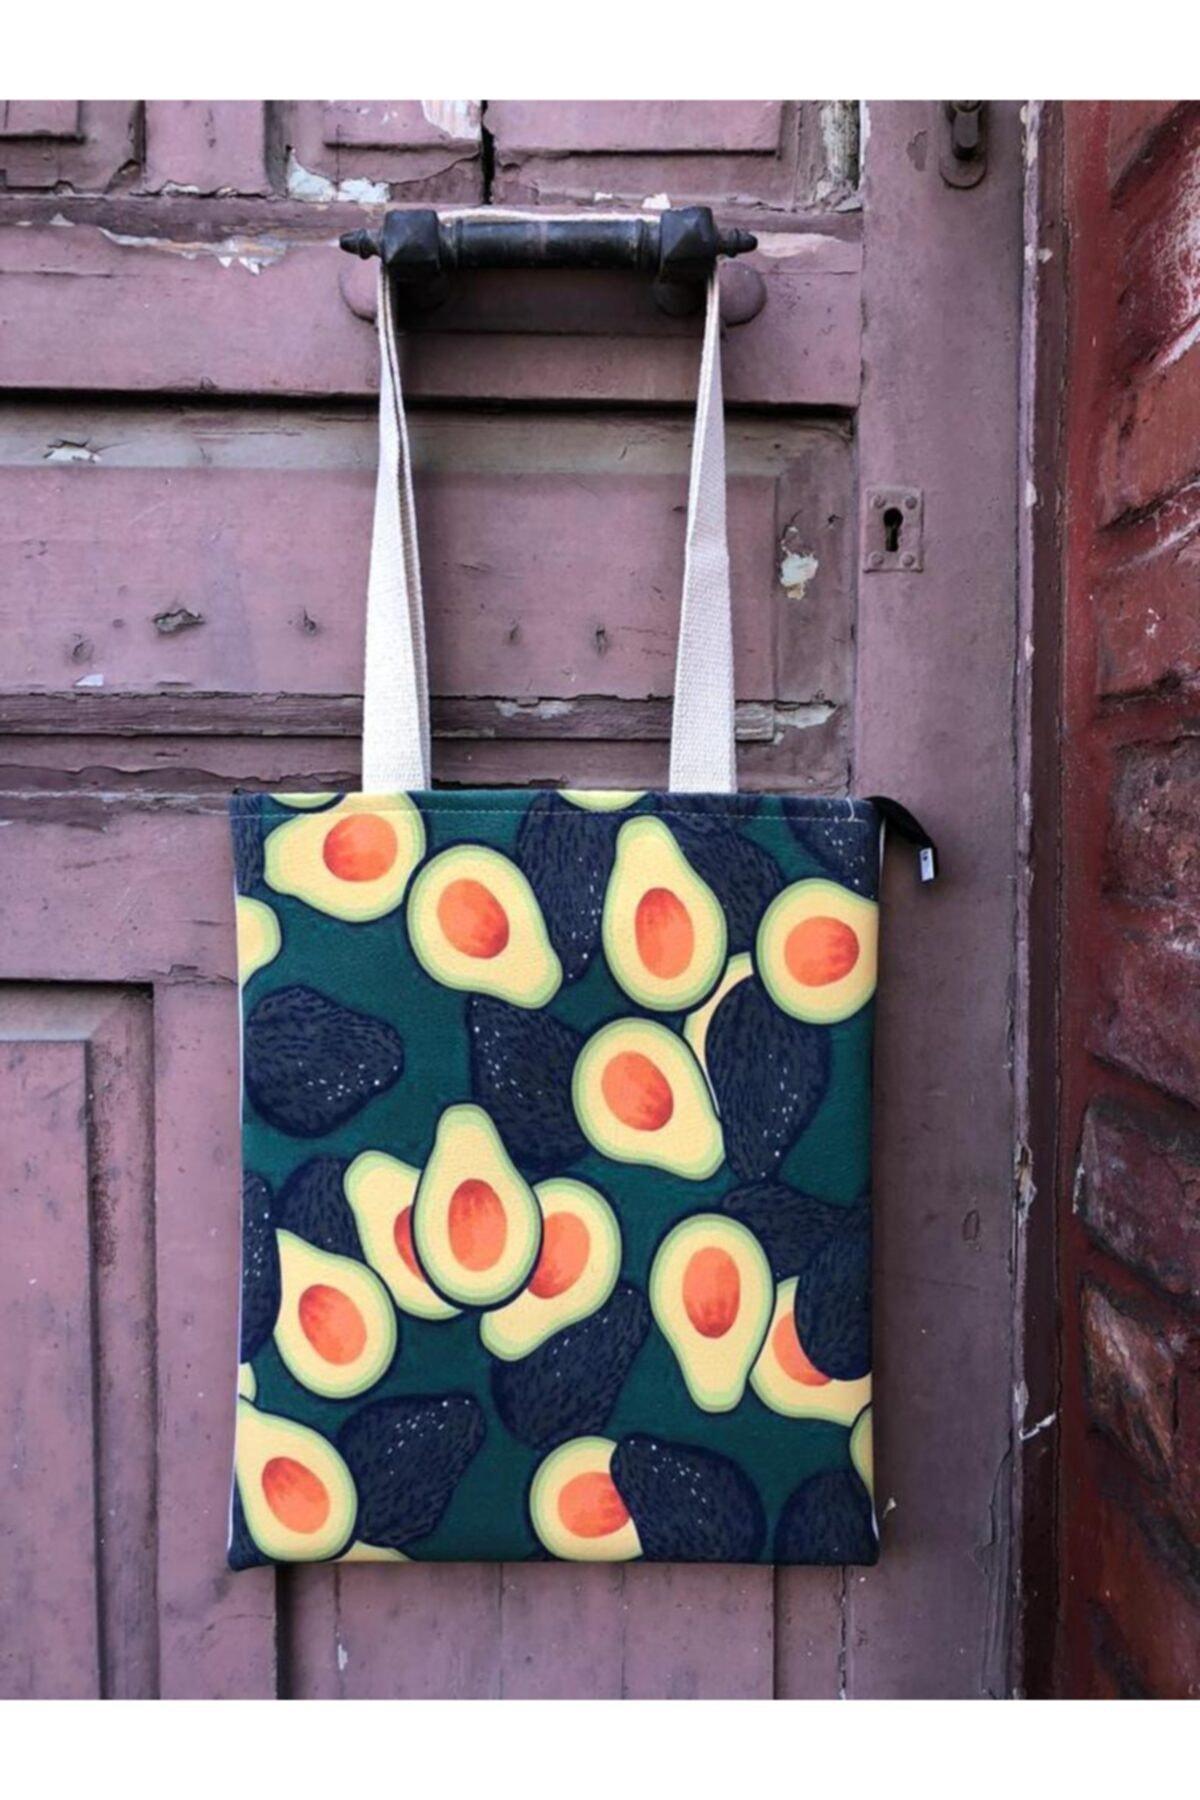 2021 New Fashion Avocado Design Printed Saddlebag - Shoulder Bag Quality Printing Lined With Inner Pocket Water Resistant